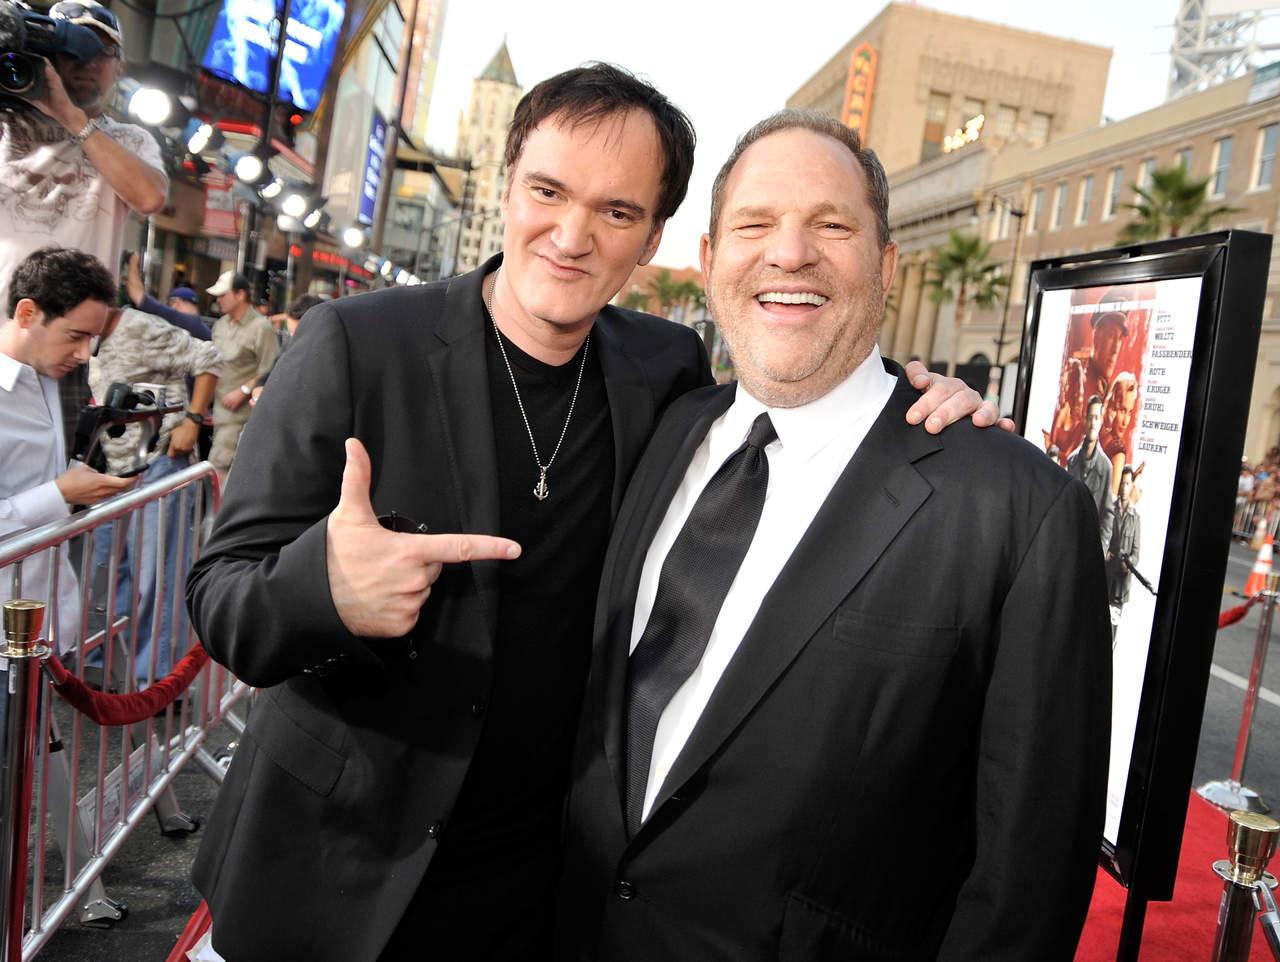 Tarantino aún no procesa la polémica sobre Weinstein